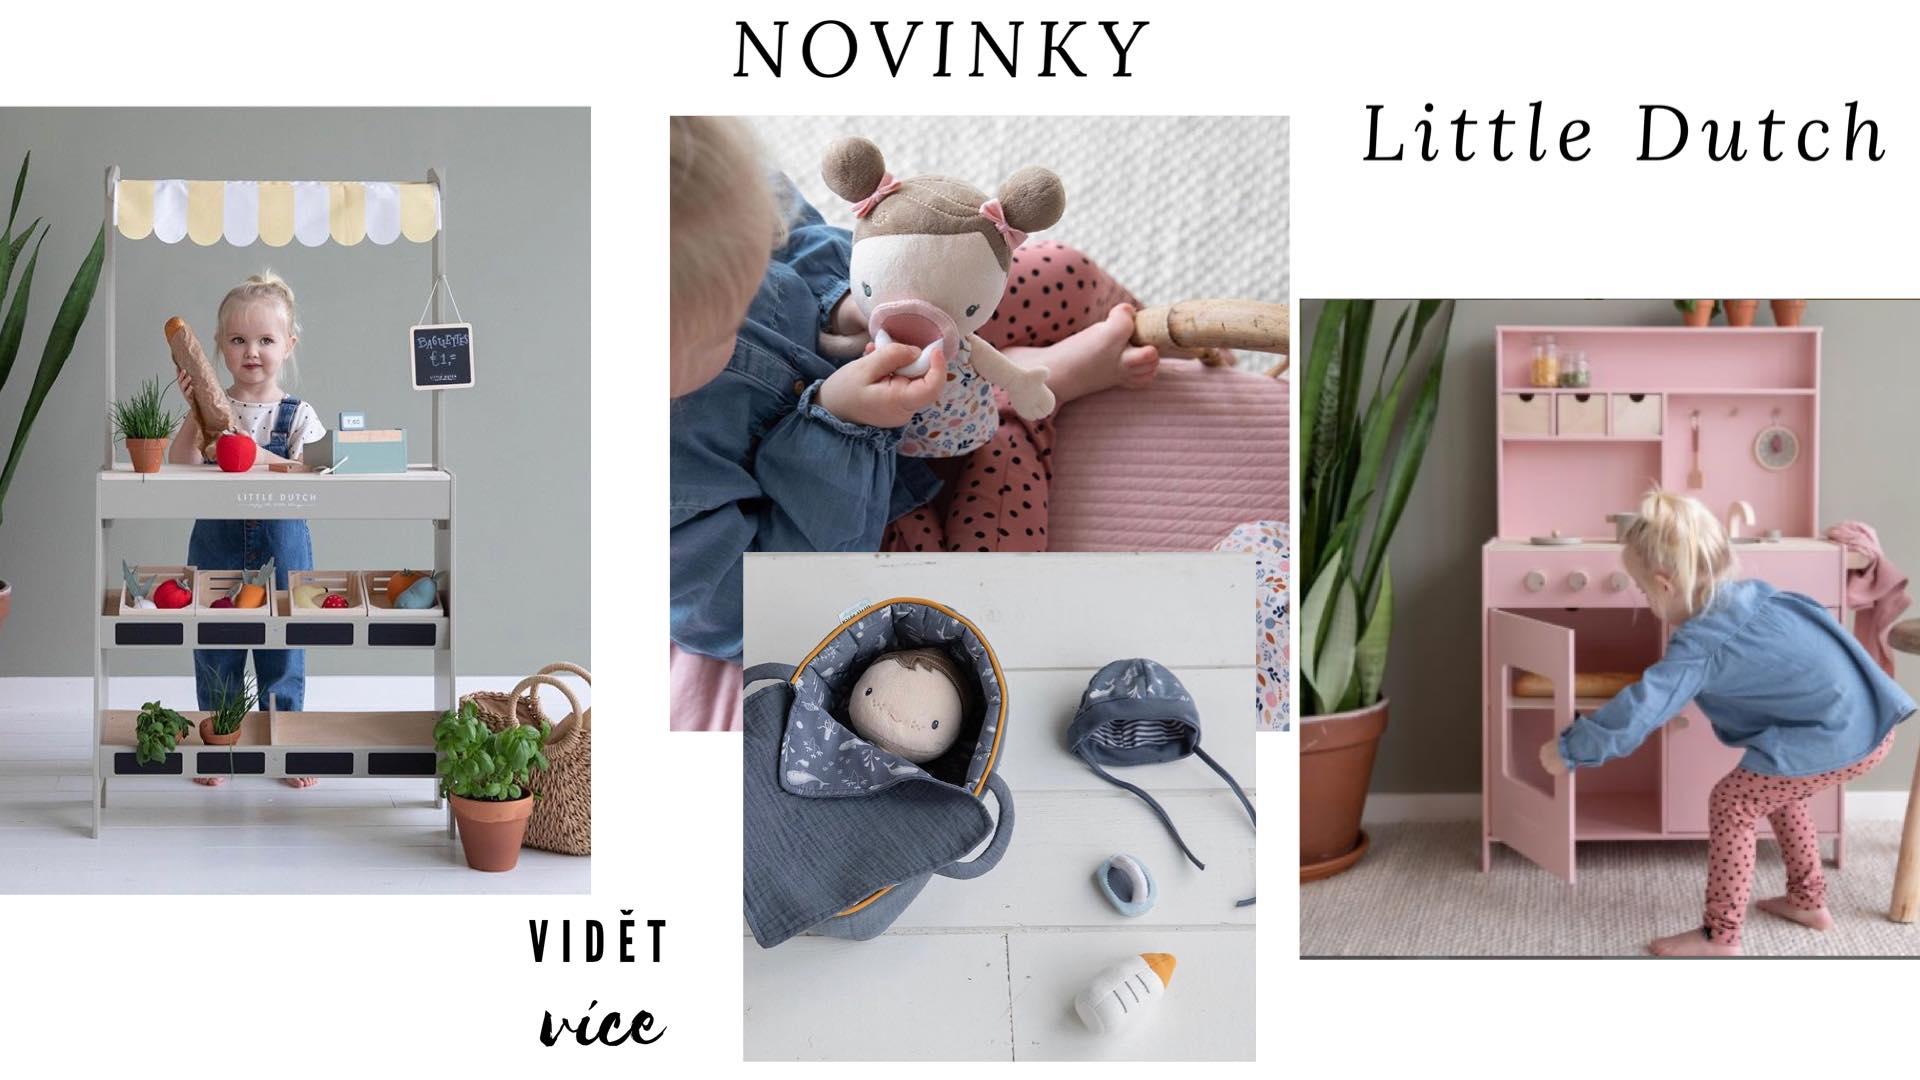 novinky little